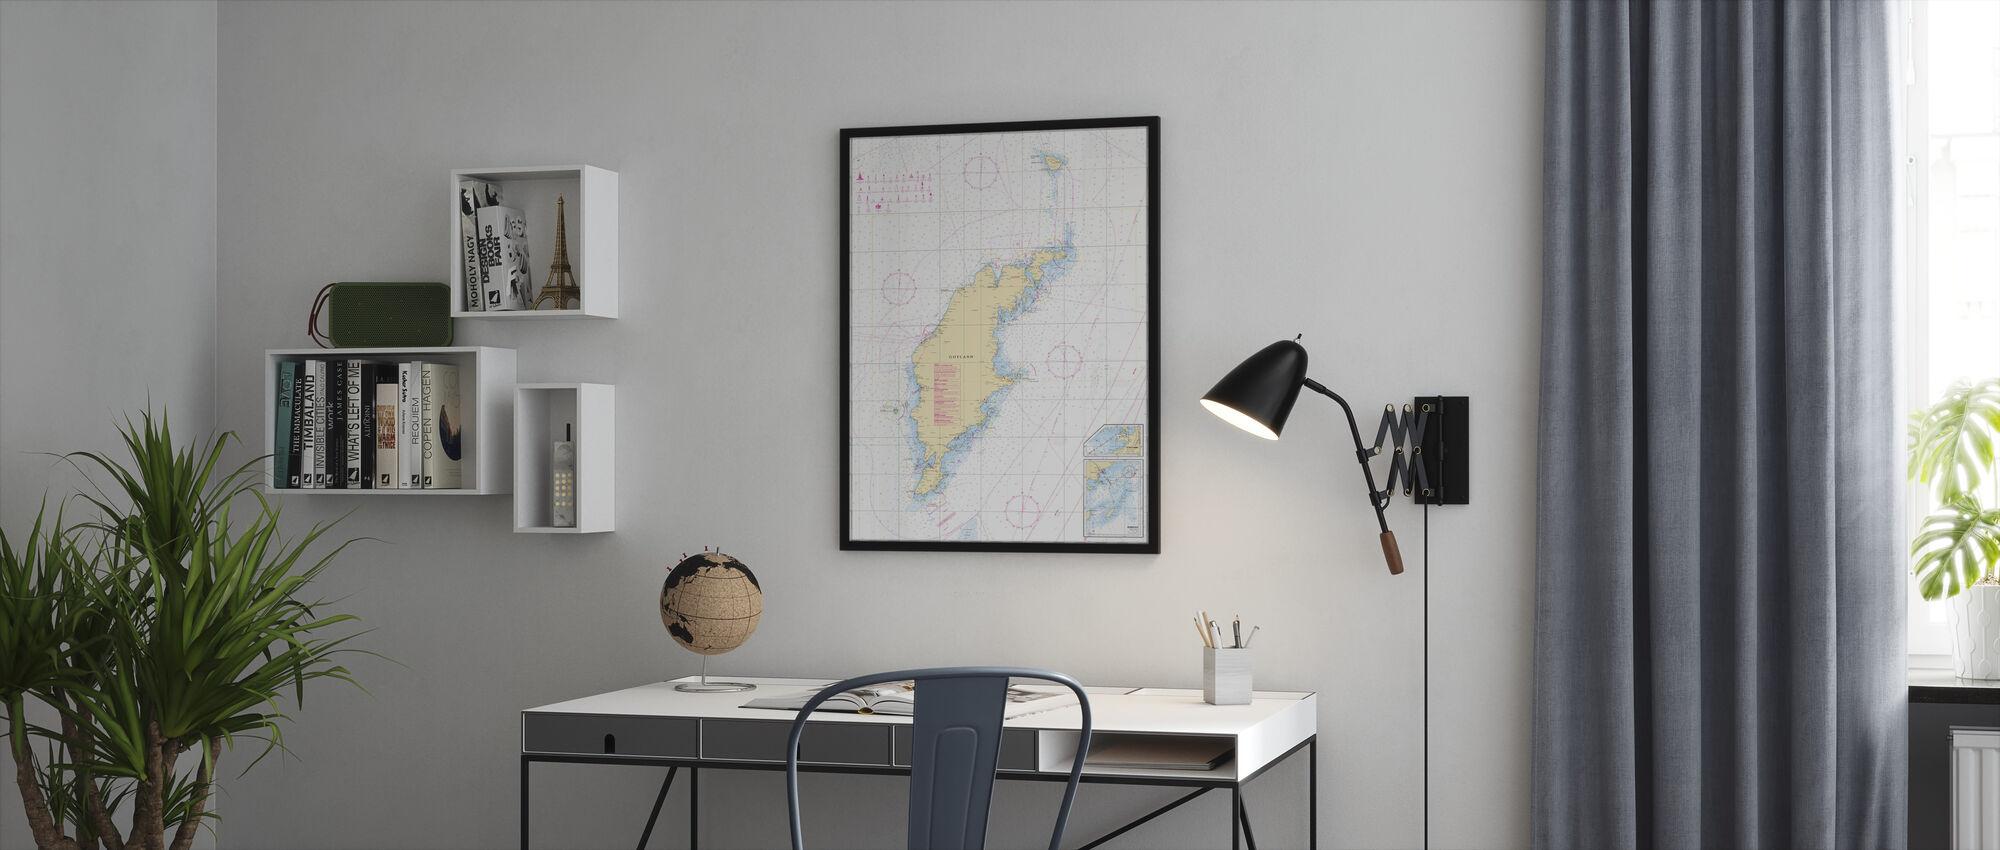 Havsdiagram 73 - Gotland - Inramad tavla - Kontor